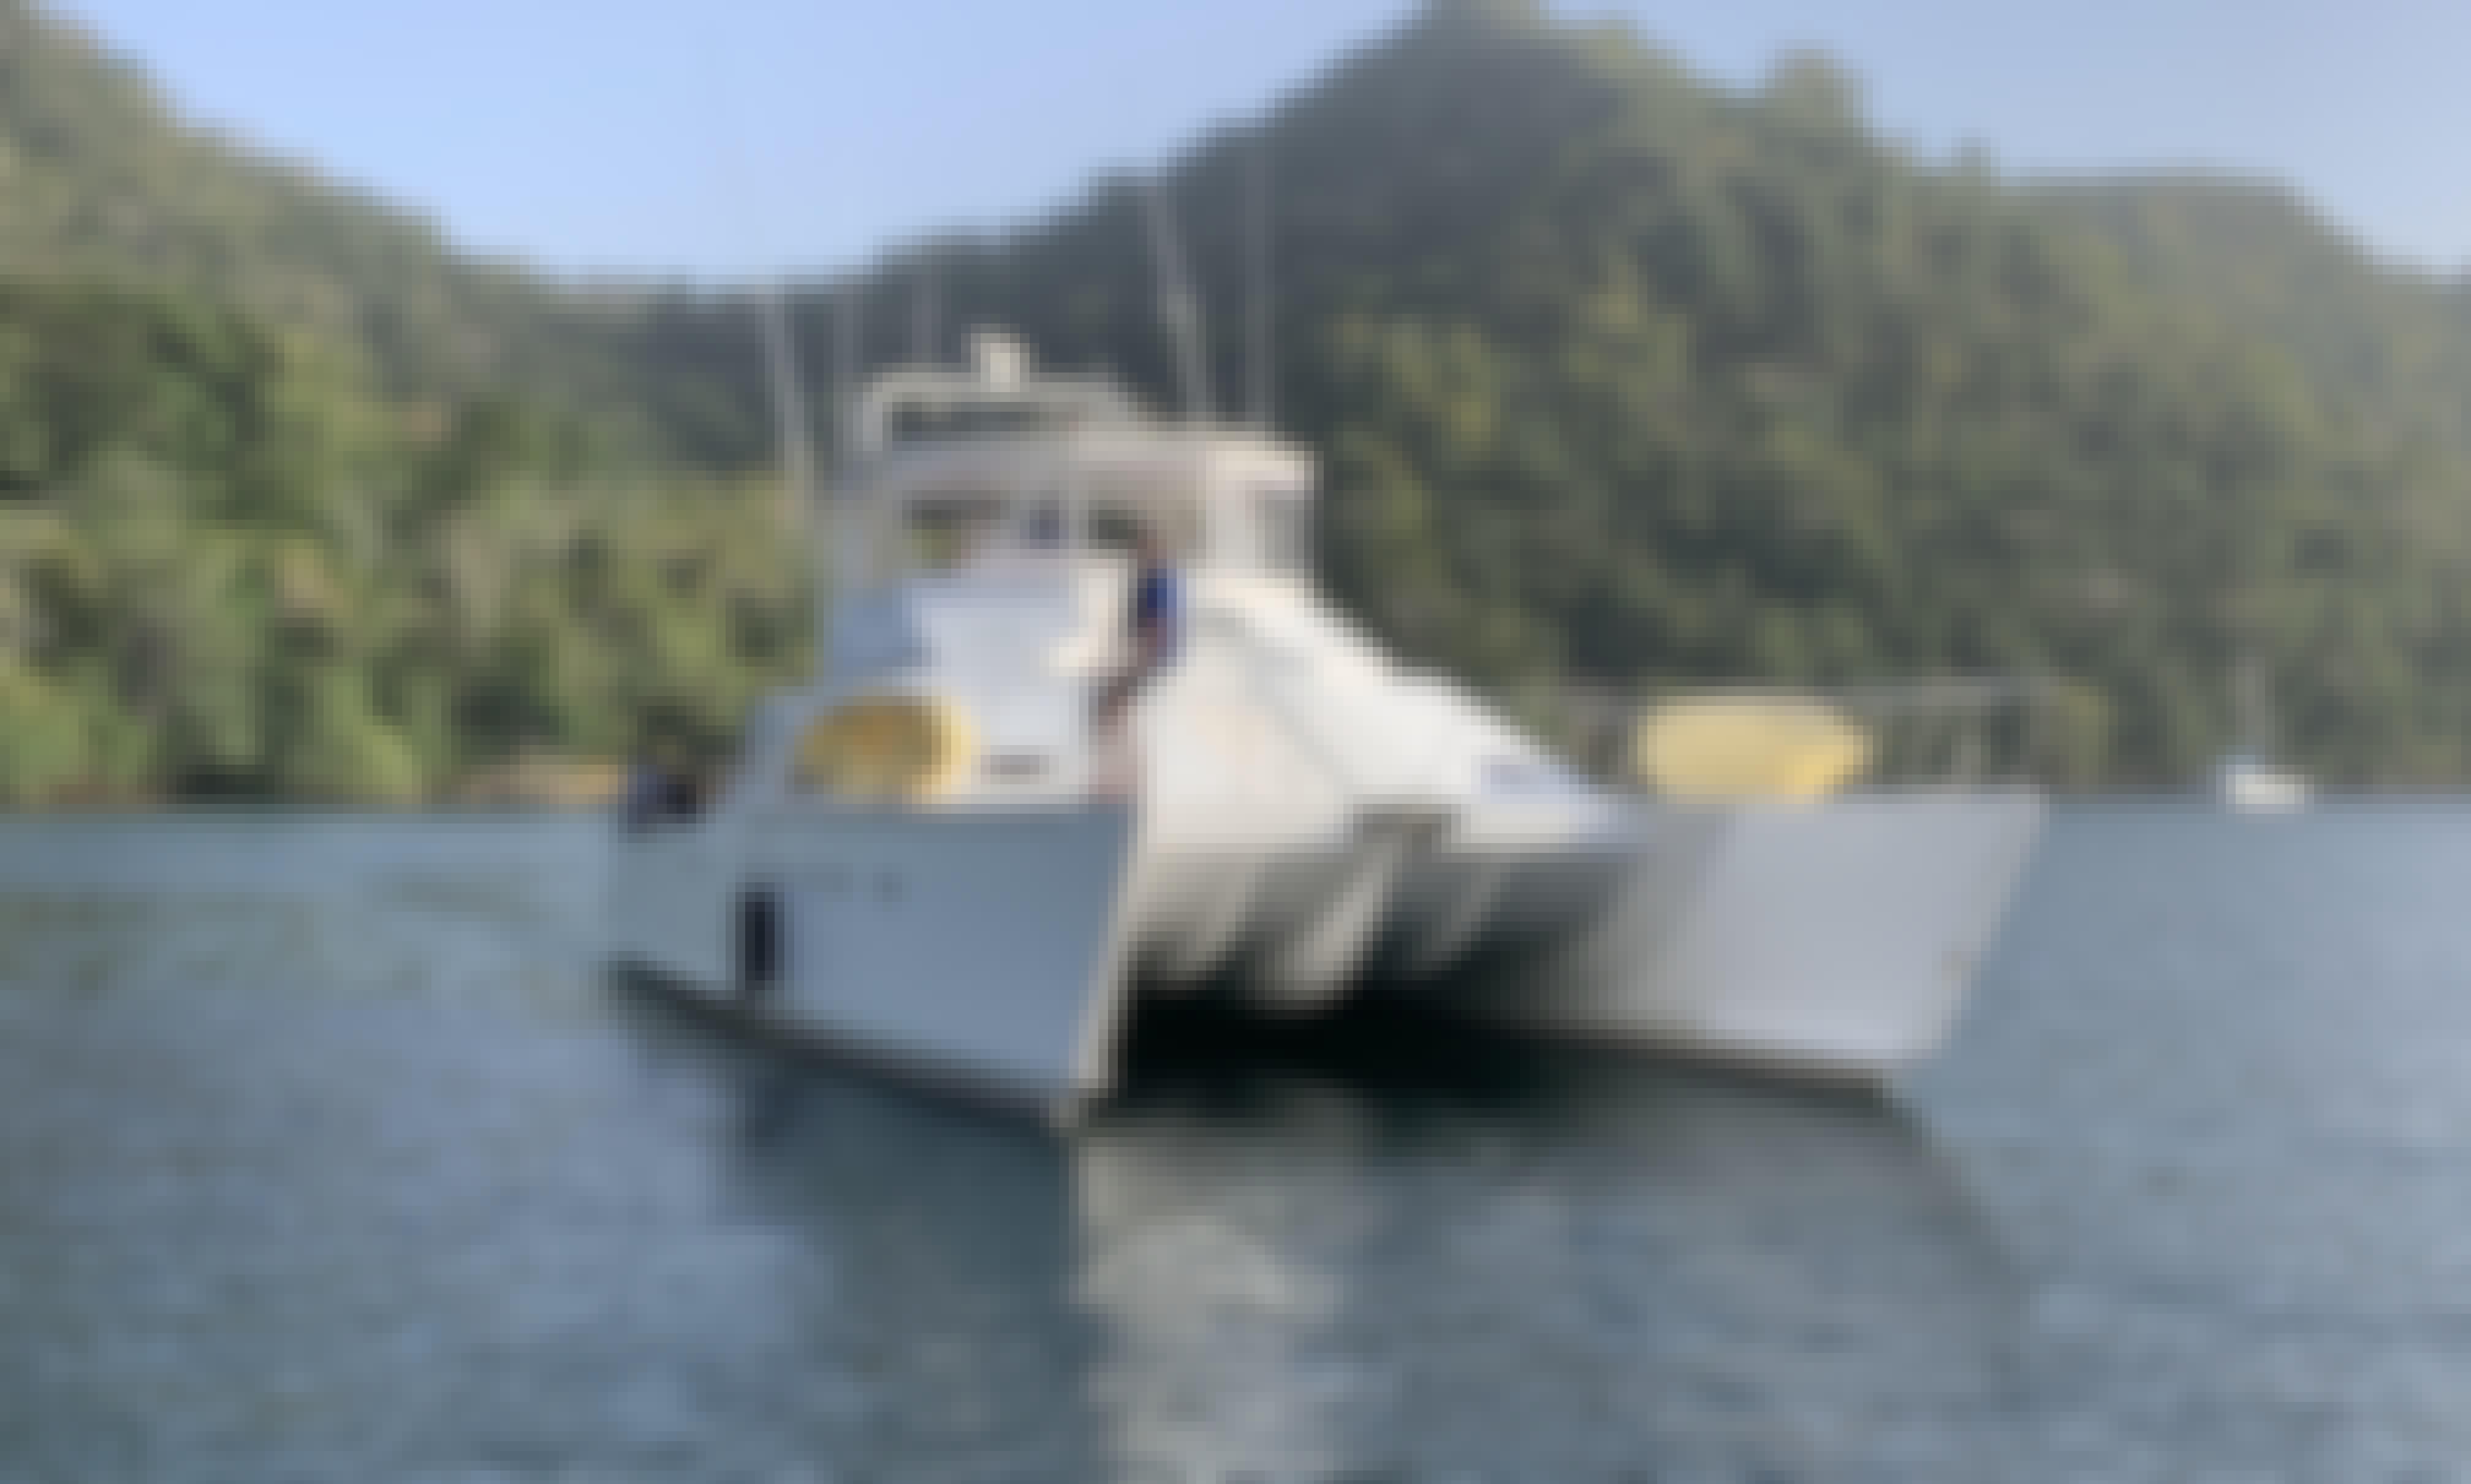 Catamaran Cruise in Point Gourde, Trinidad and Tobago